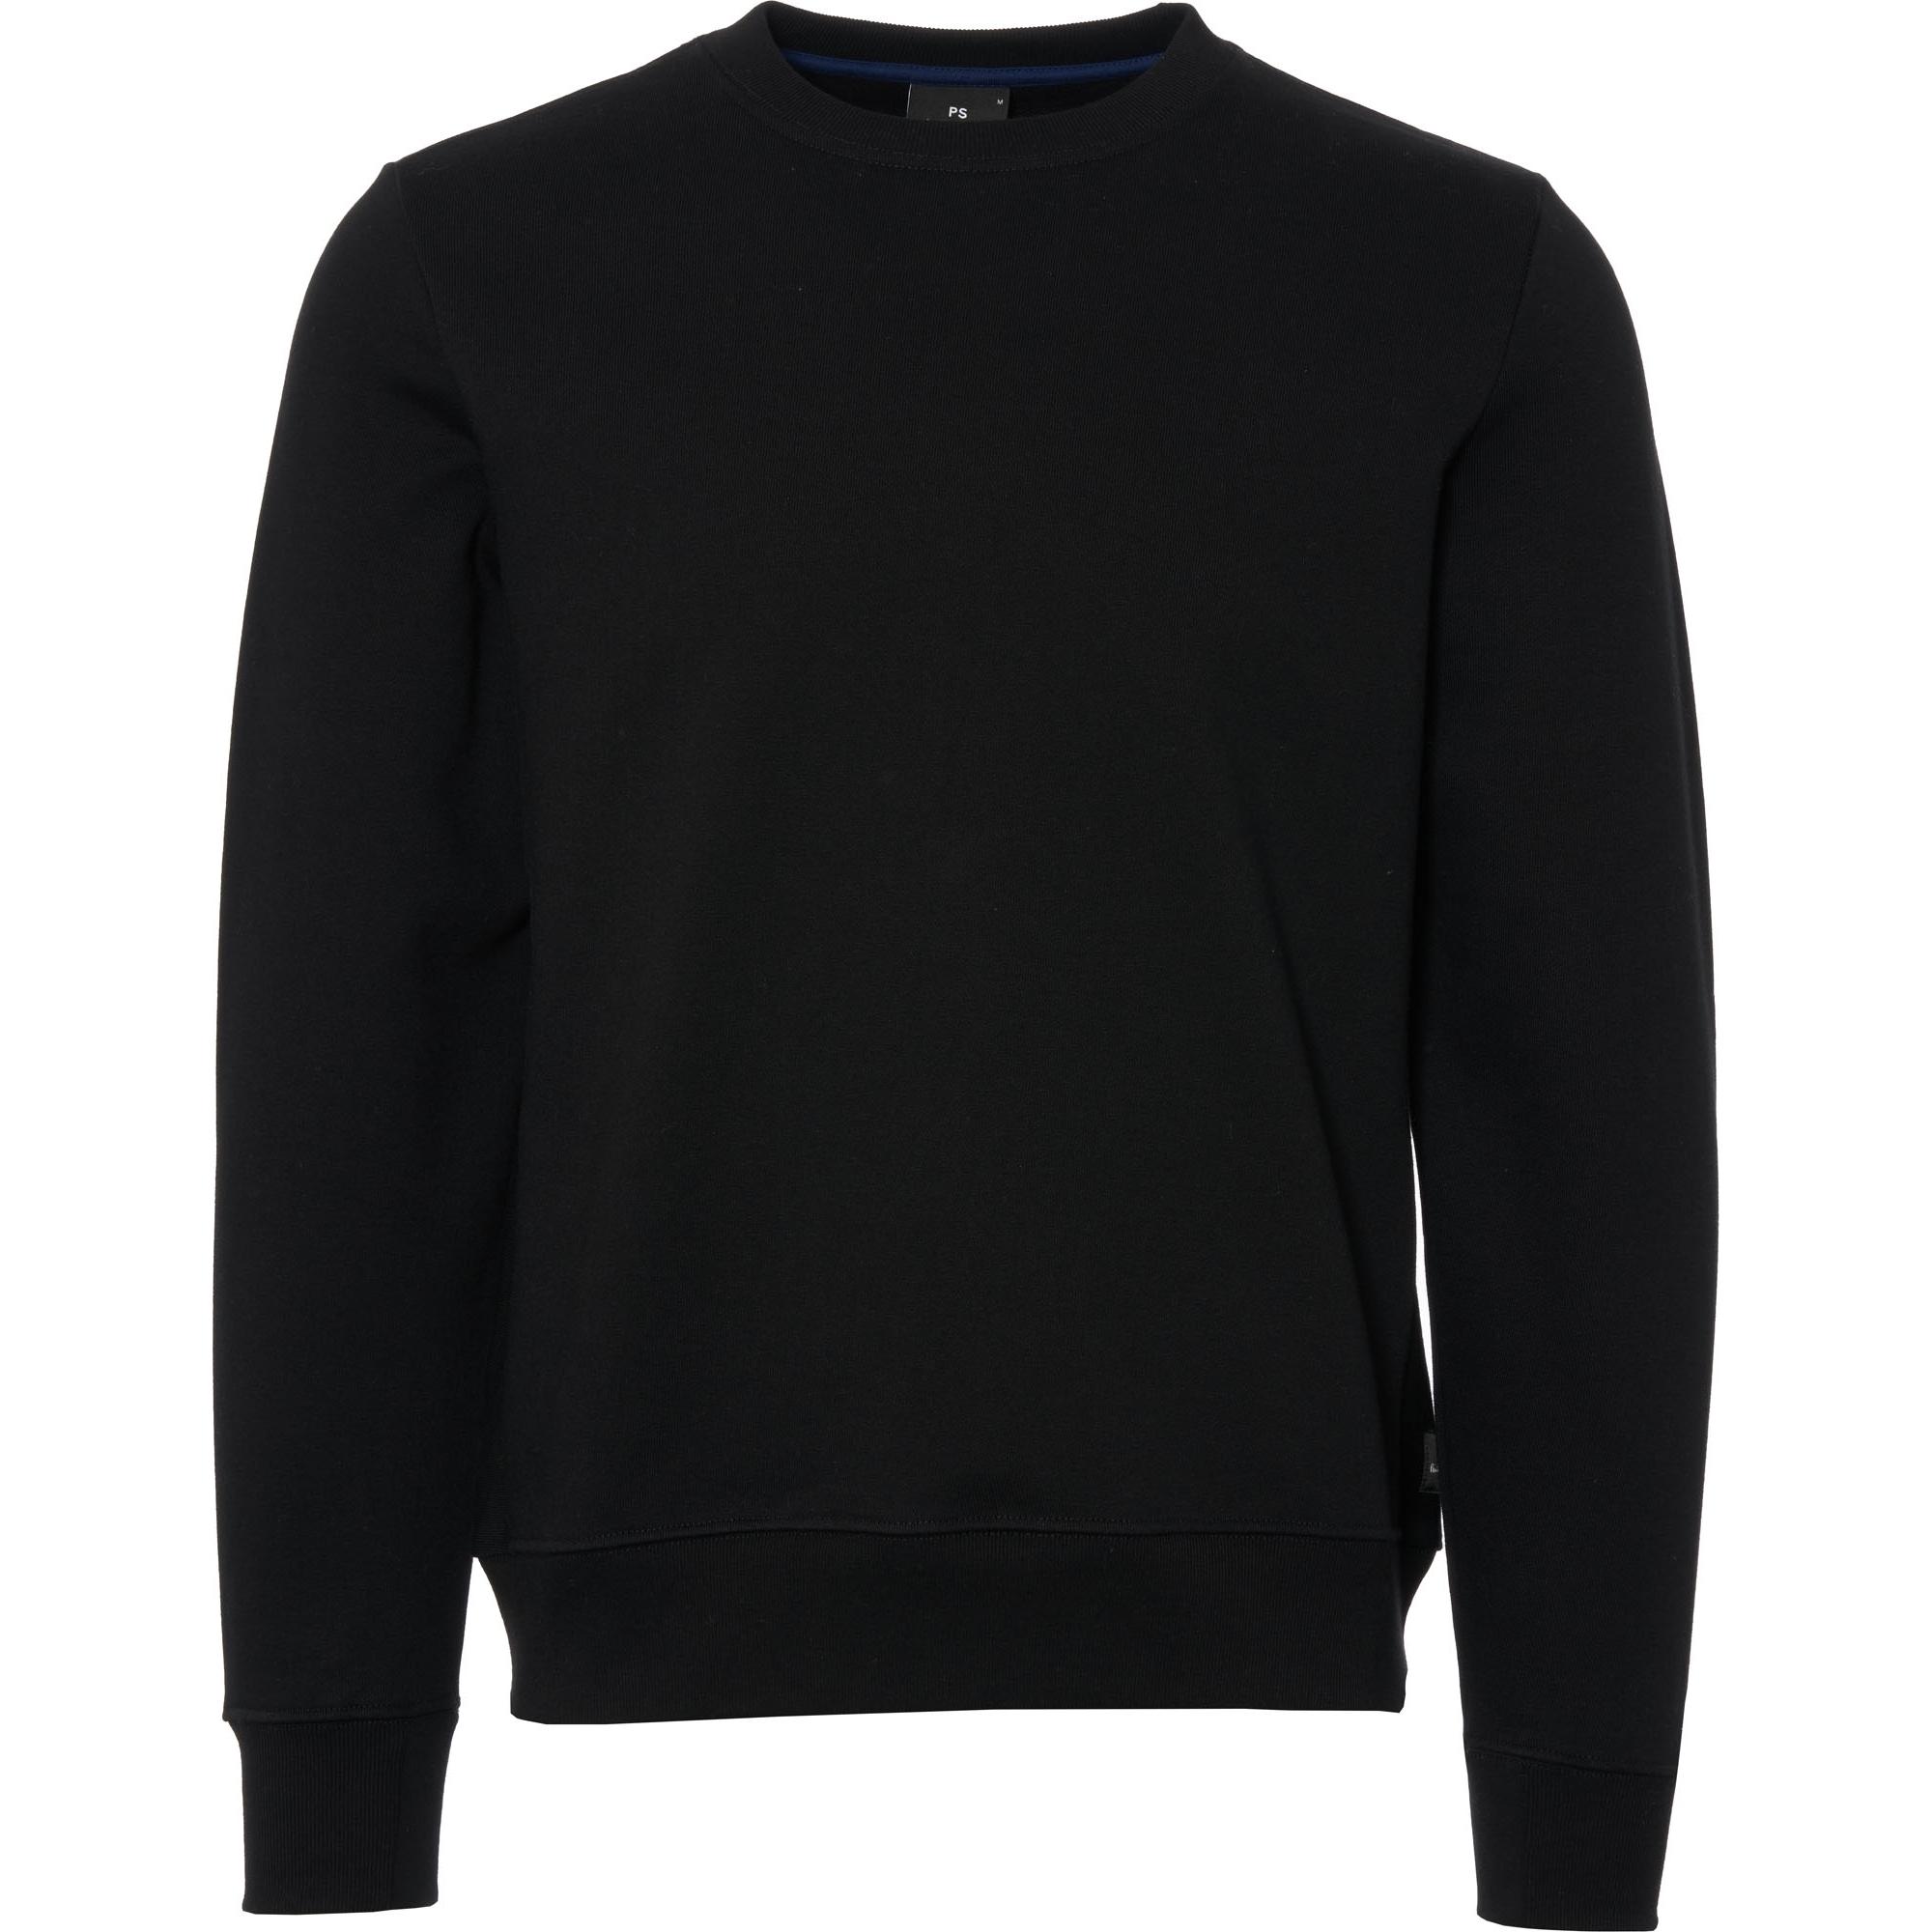 pspaul smith crewneck sweatshirt | black | m2r-027r 79